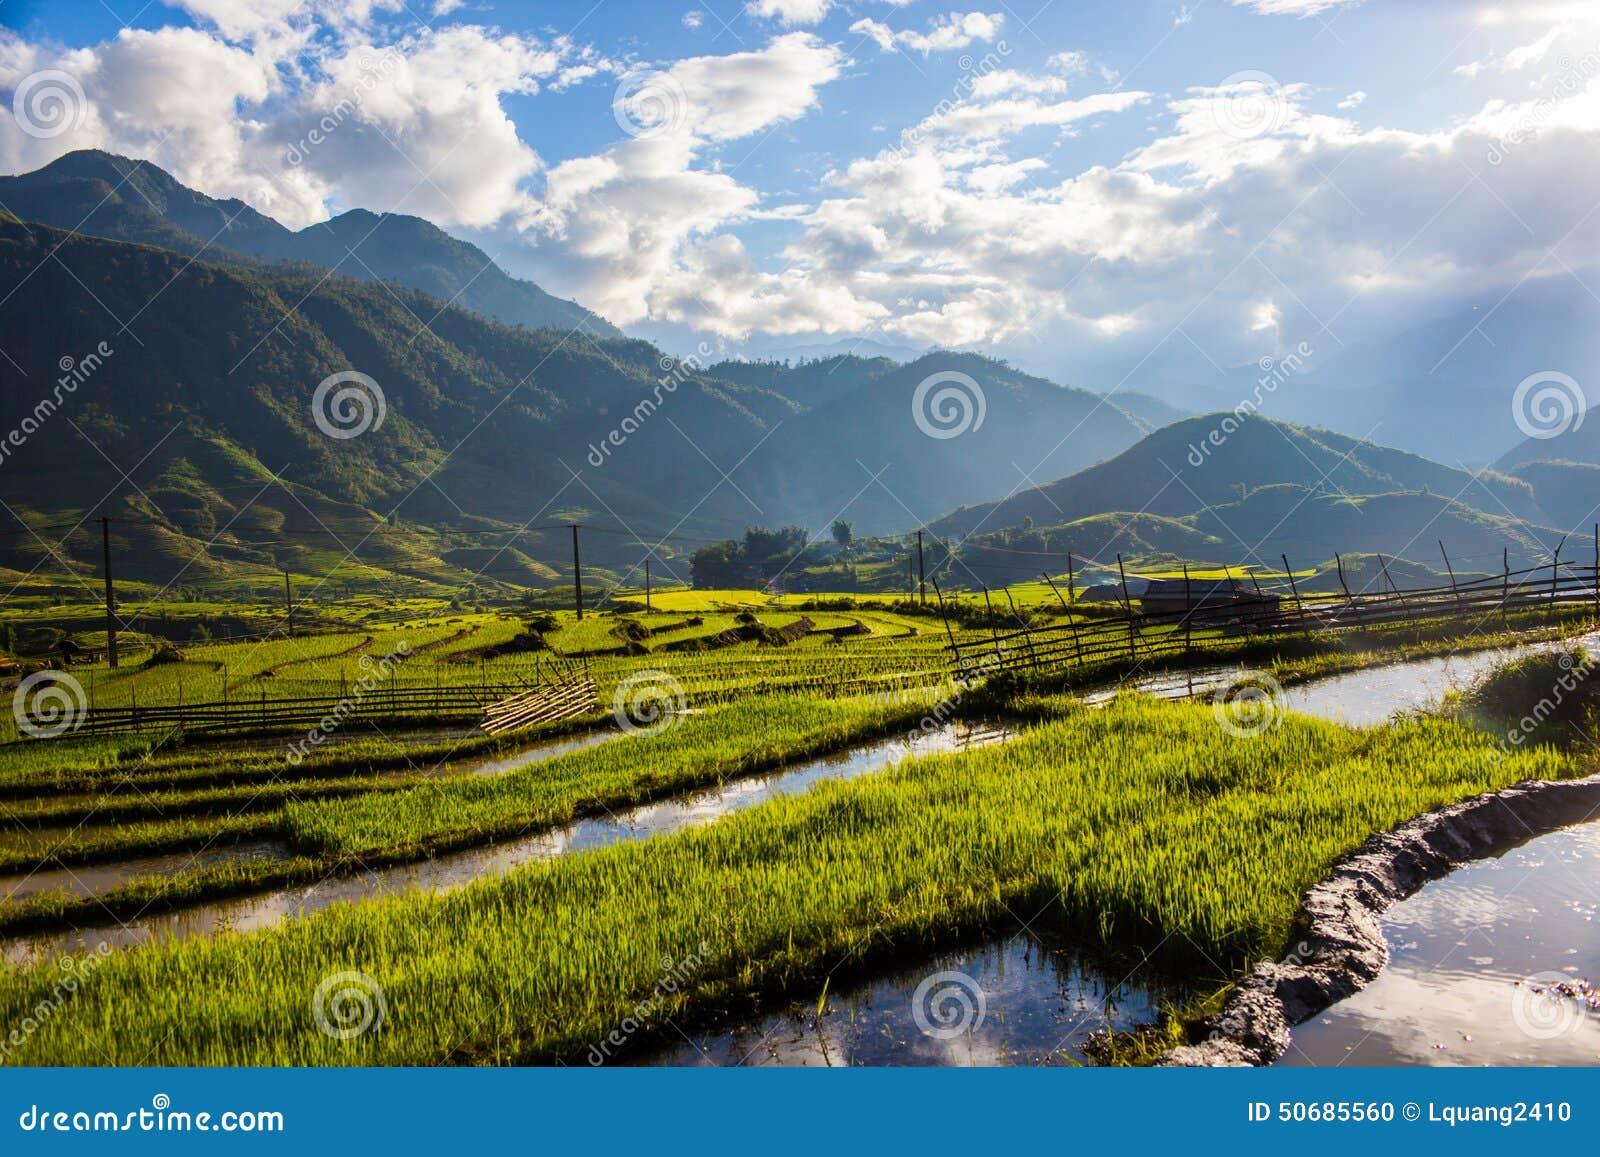 Download 大阳台在Sapa越南 库存照片. 图片 包括有 山坡, 贫穷, 农场, 冷静, beautifuler, 农村 - 50685560